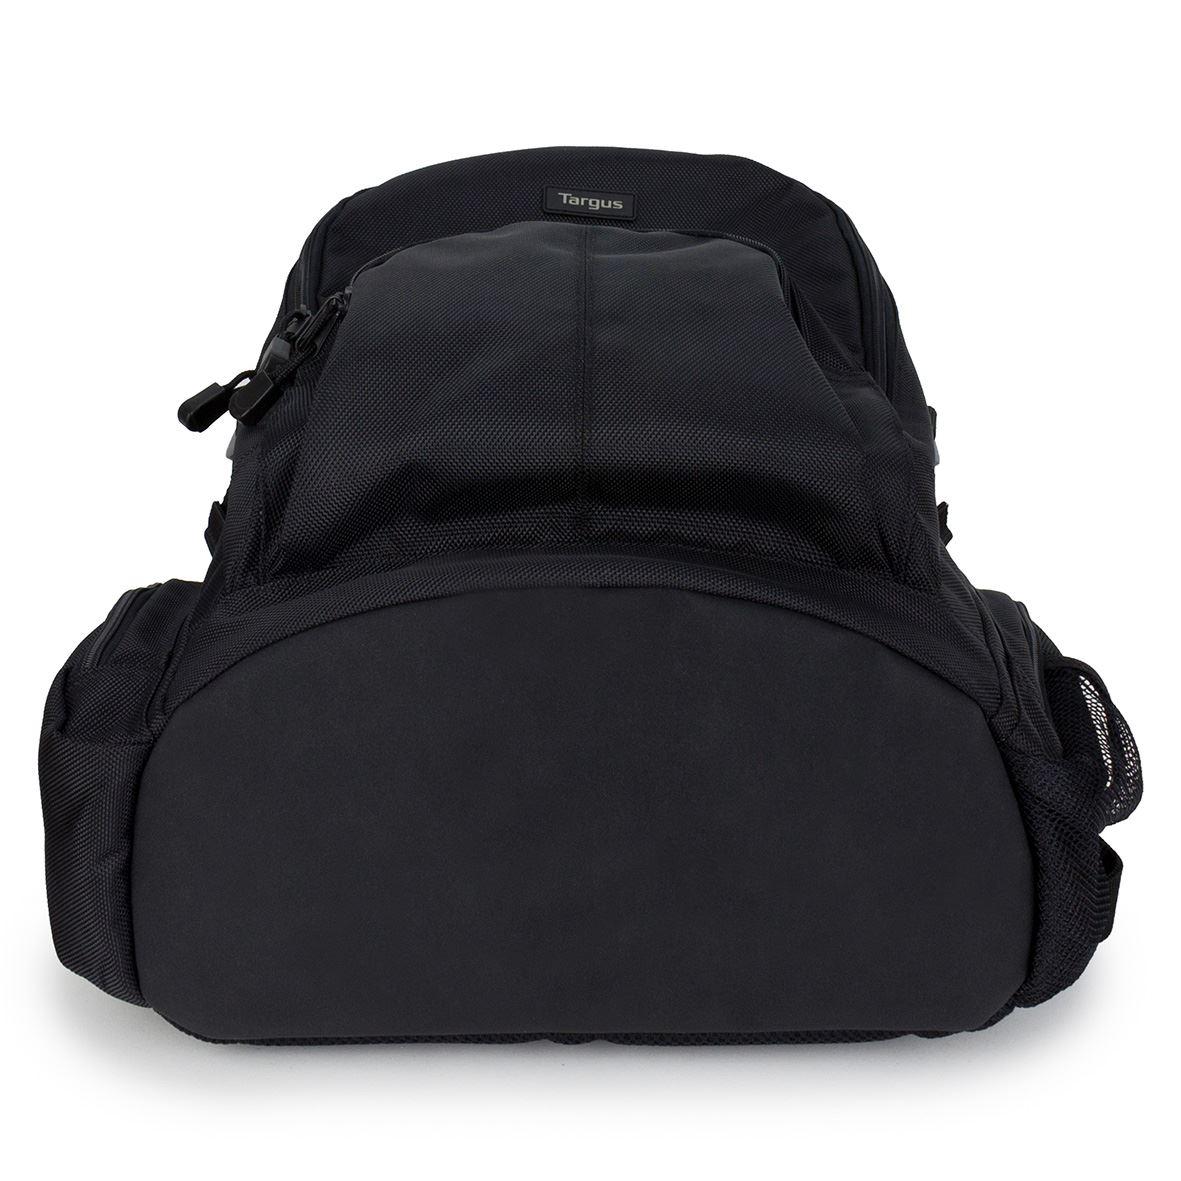 "Targus Sac a dos CN600 Classic 15.6"" Backpack Nylon Black (CN600) - Achat / Vente Sac et Sacoche sur Cybertek.fr - 2"